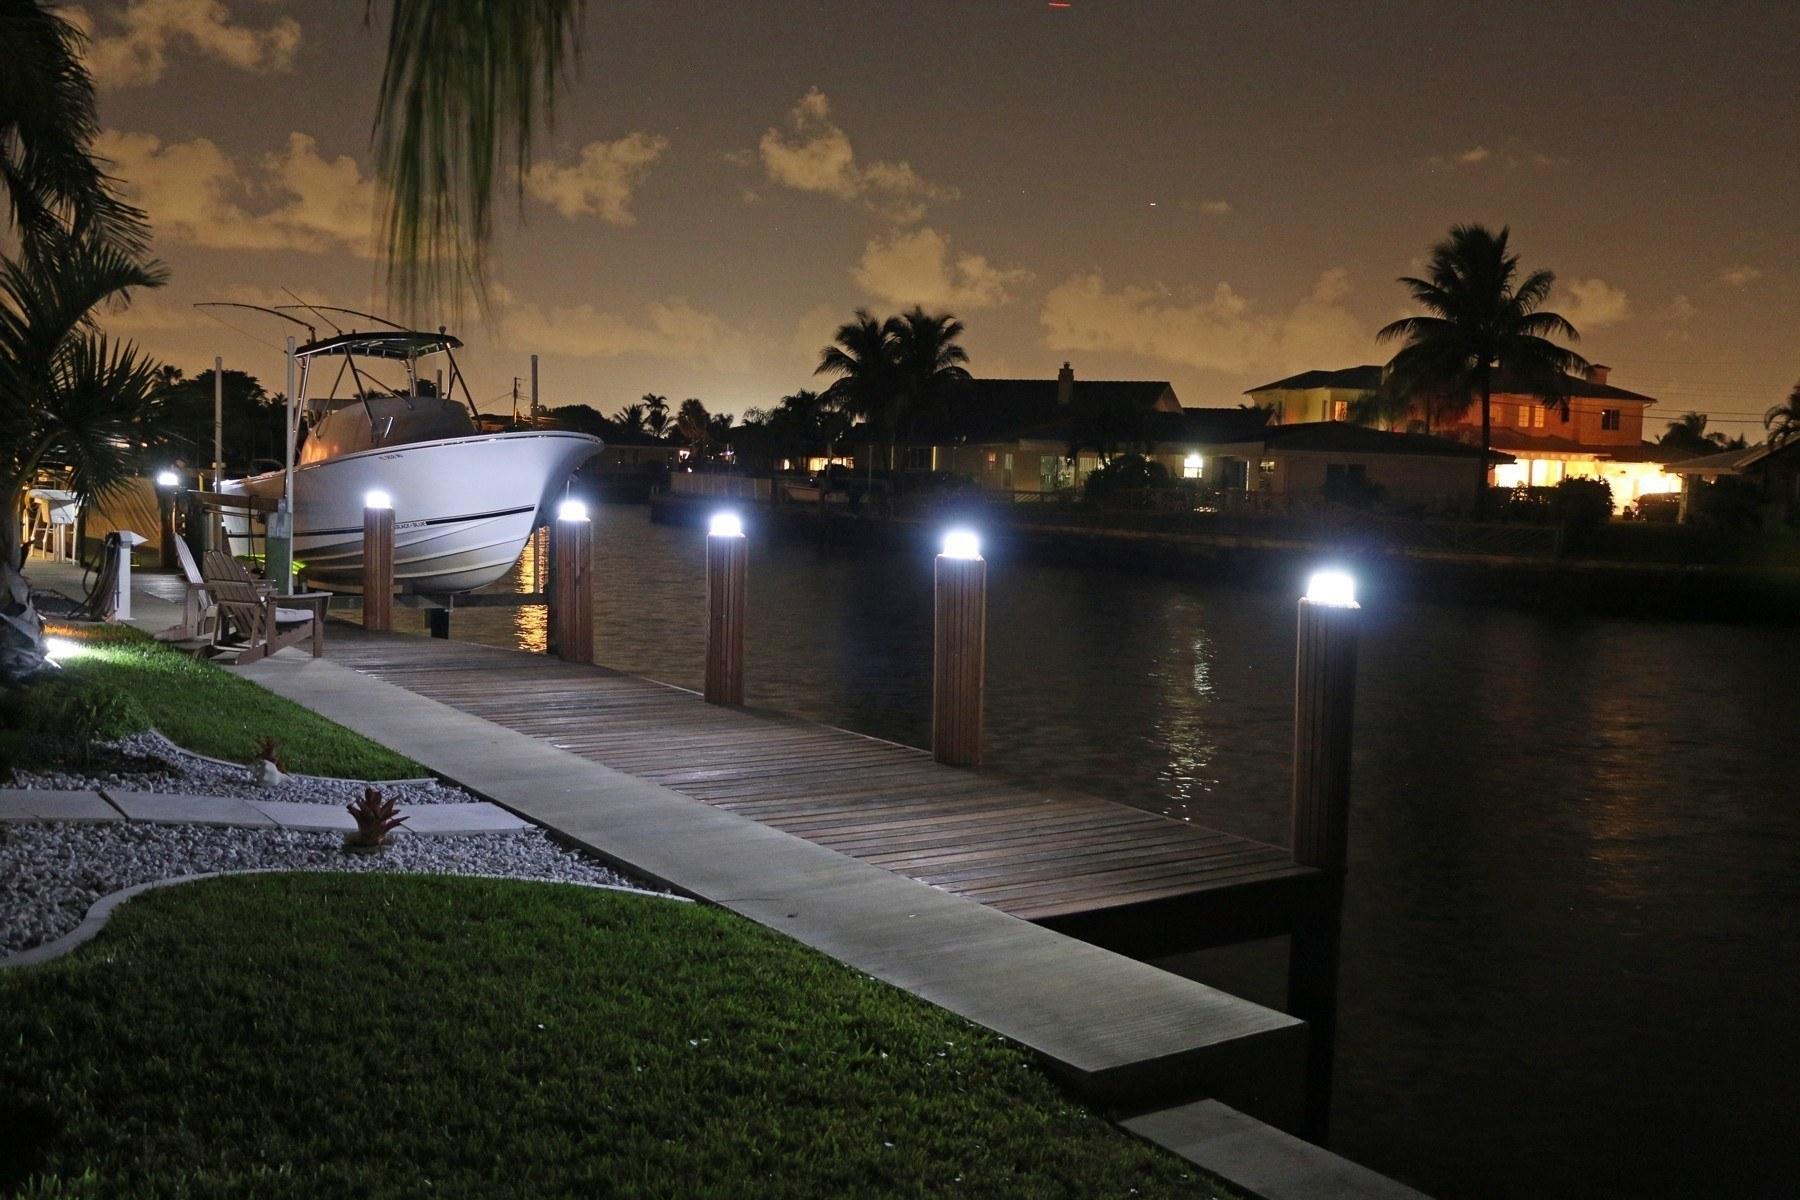 Solar Piling Light Street Lightsolar Led With 12 24v Circuitsolar Black 3 Color Switchable